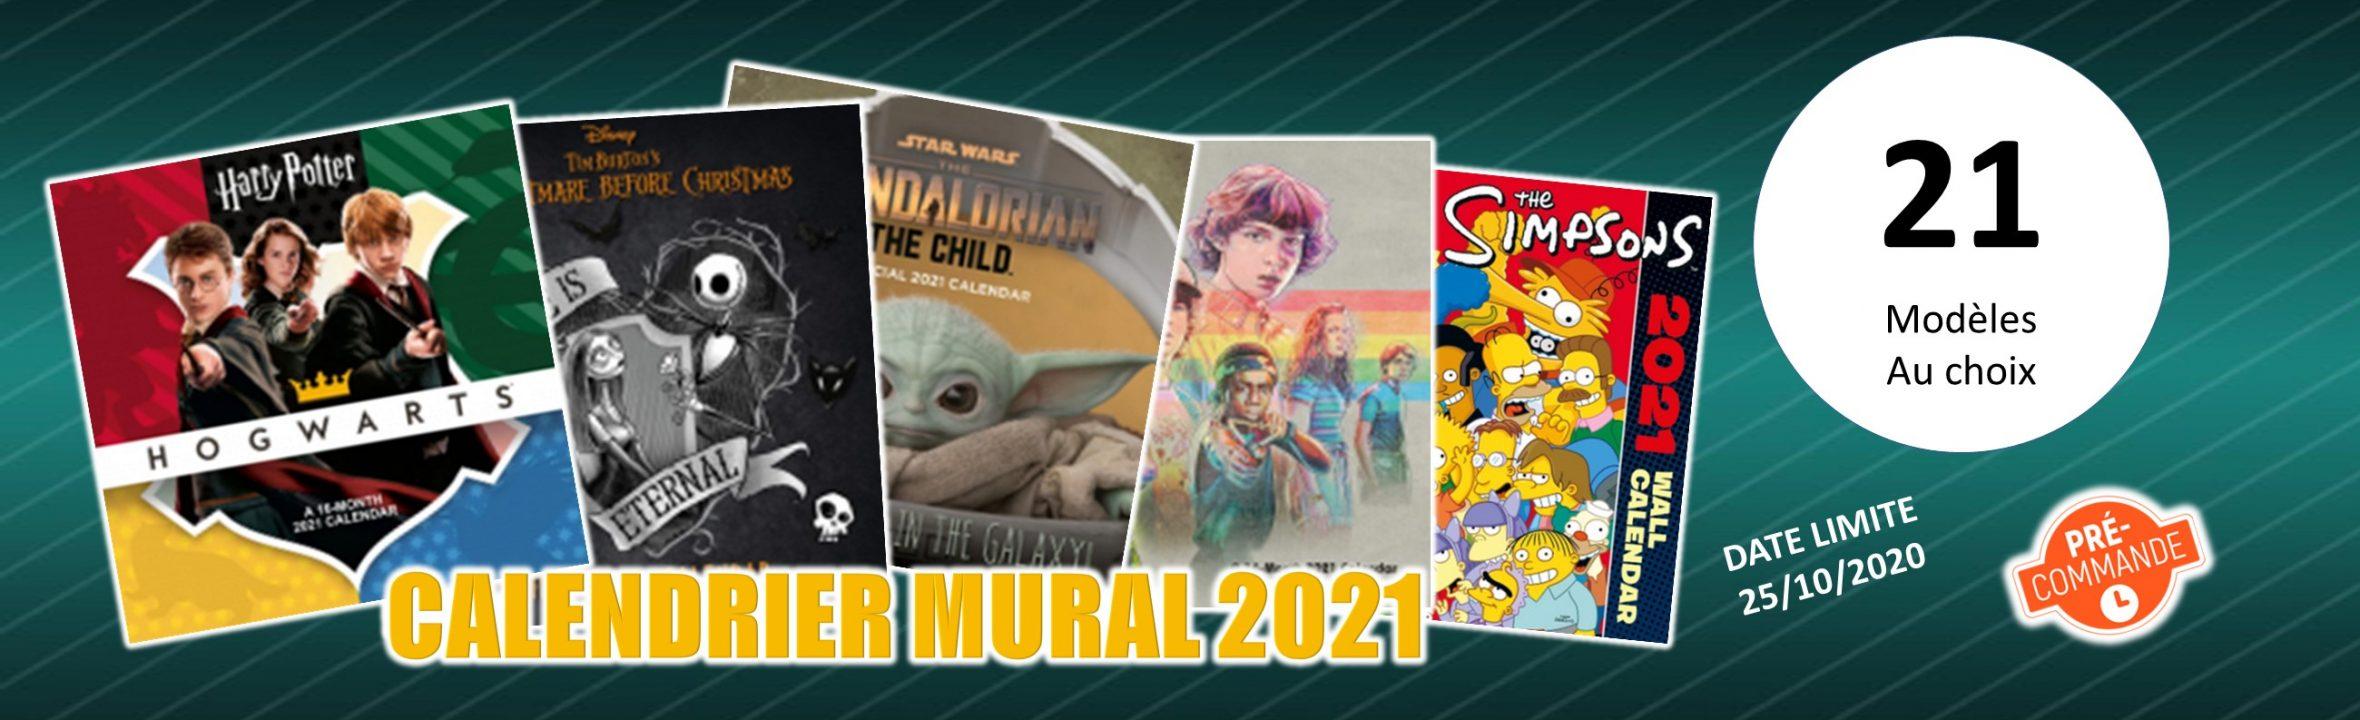 calendrier mural 2021 goodin shop